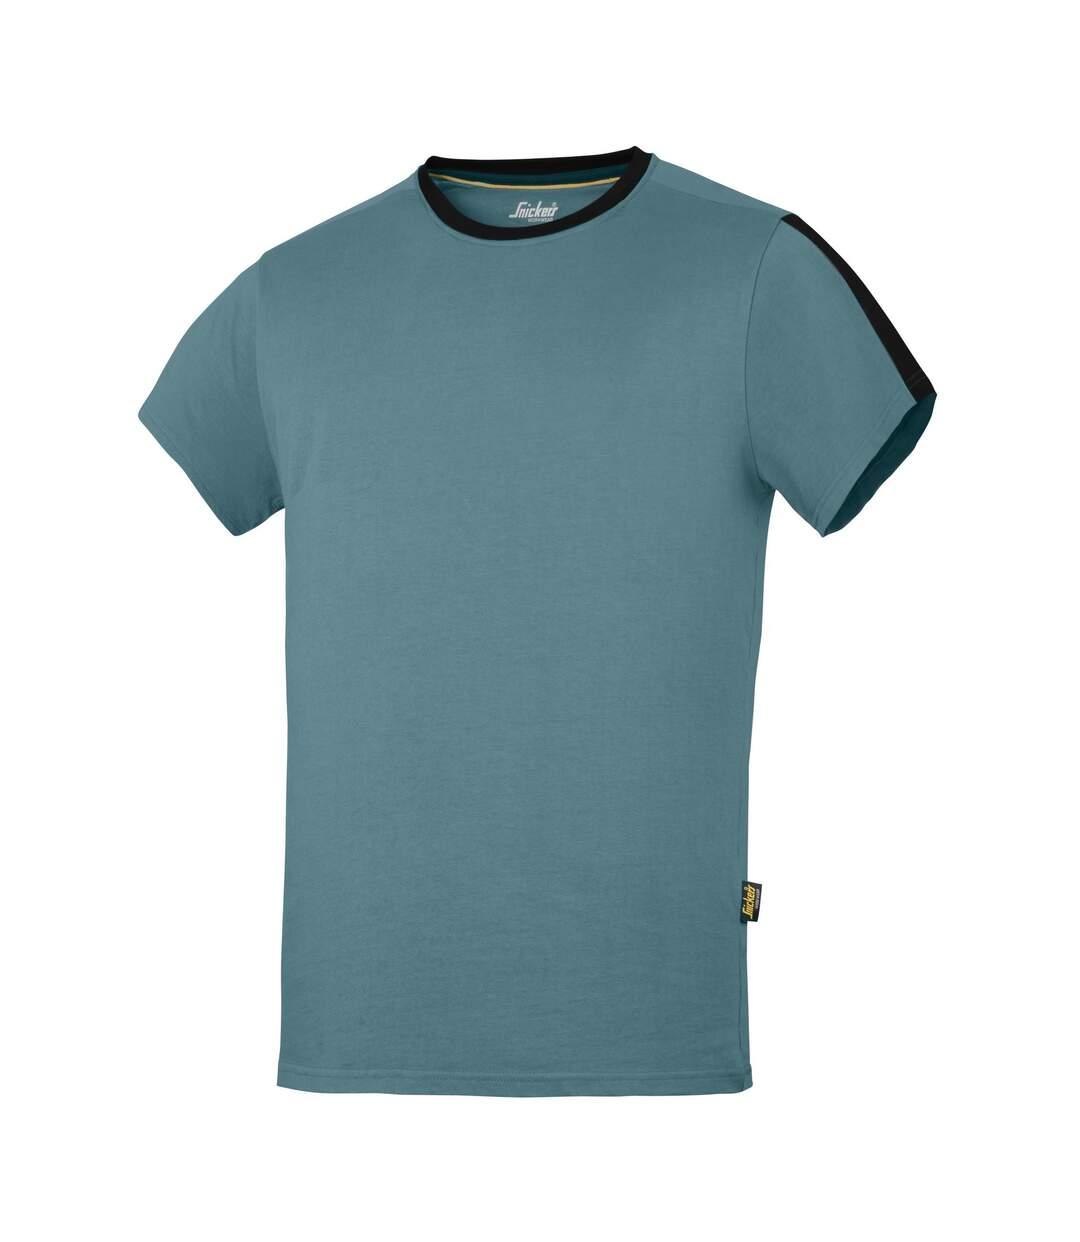 Snickers Mens AllroundWork Short Sleeve T-Shirt (Petrol/Black) - UTRW5482